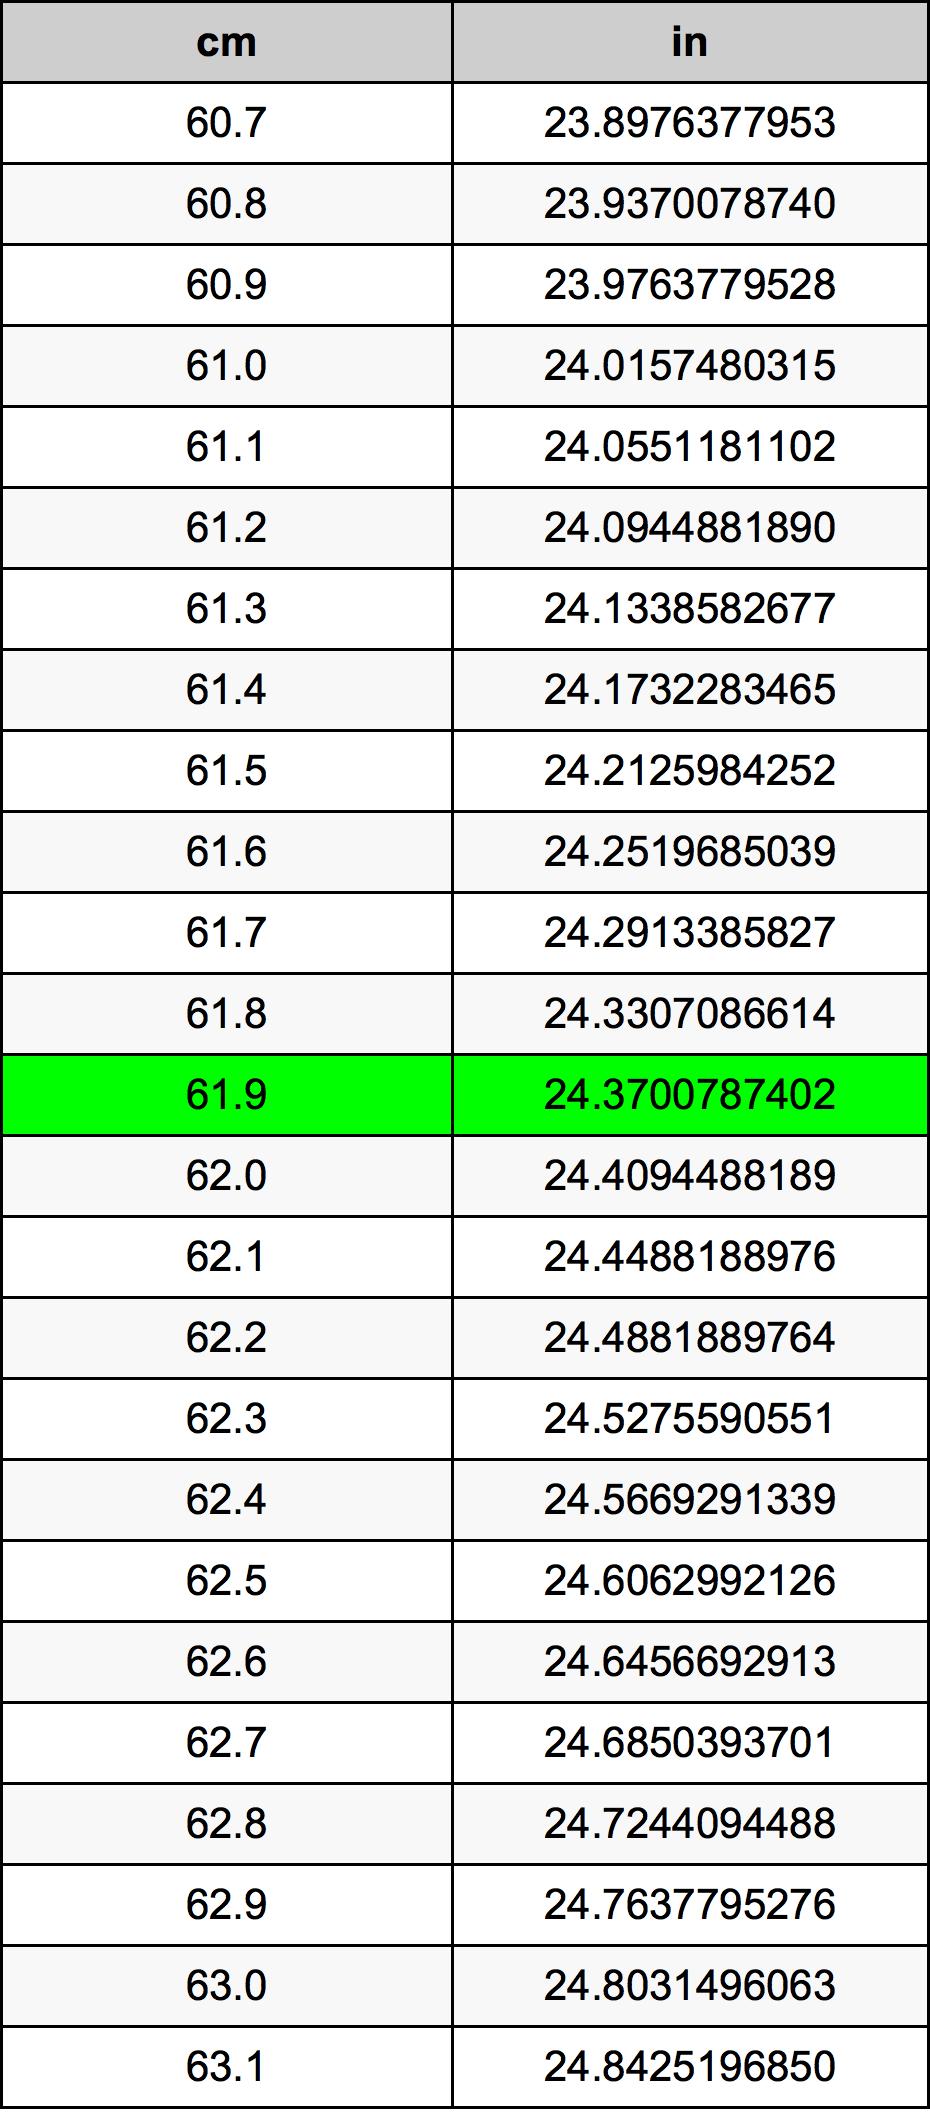 61.9 Centimeter konverteringstabellen